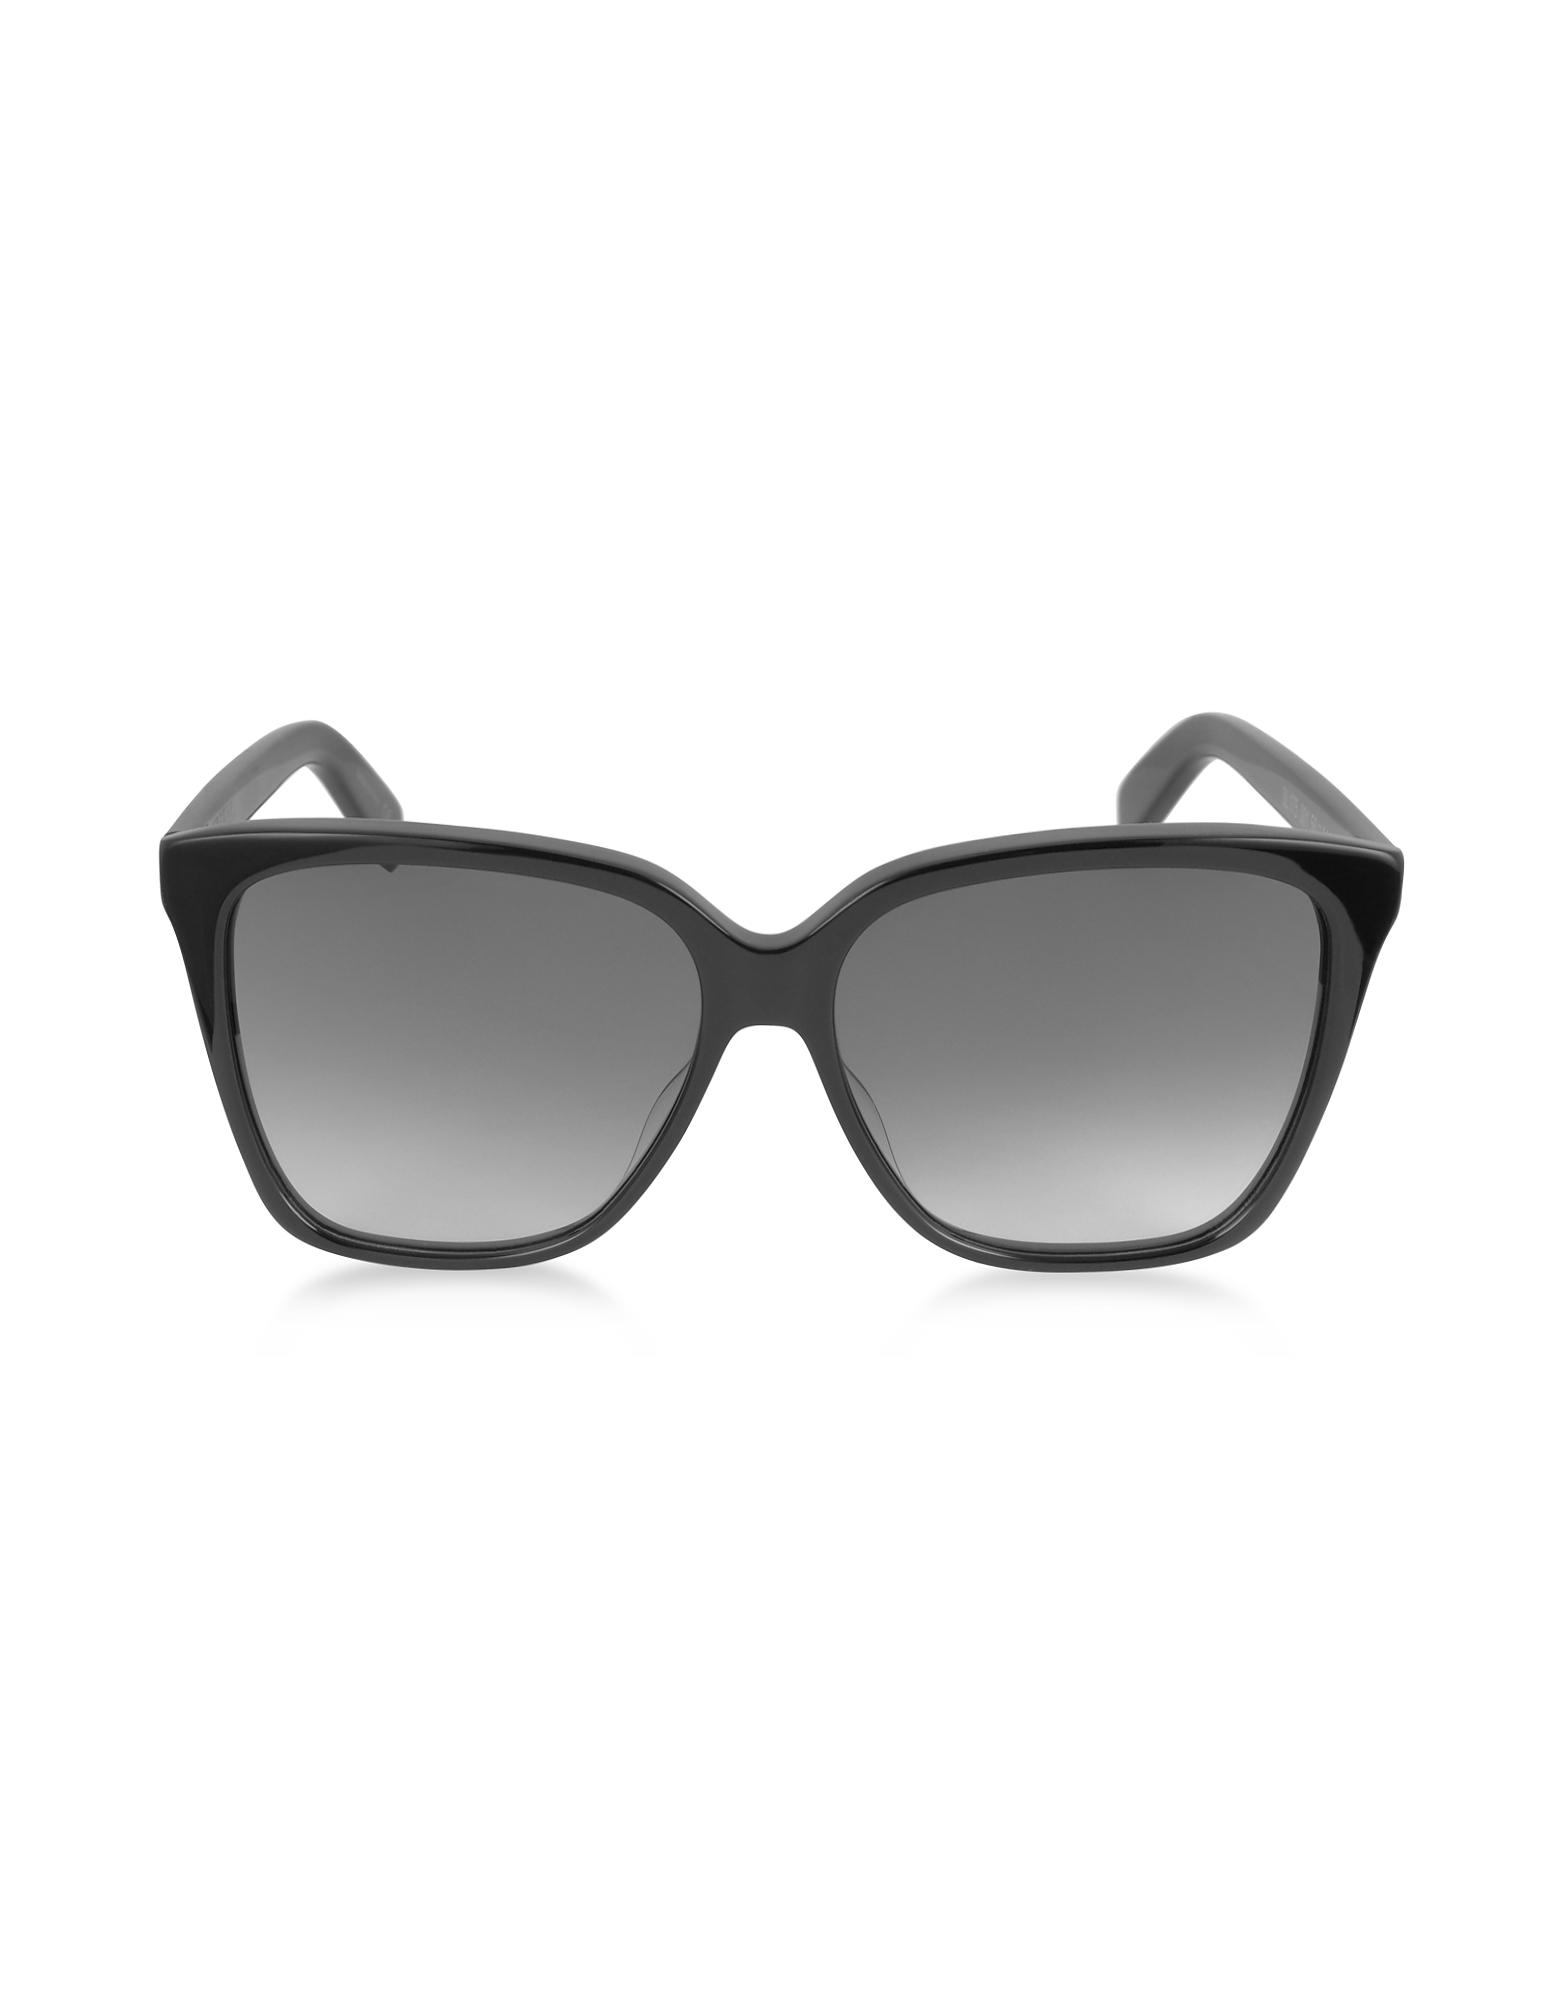 Saint Laurent Sunglasses, SL 175 Large Square-Frame Acetate Women's Sunglasses